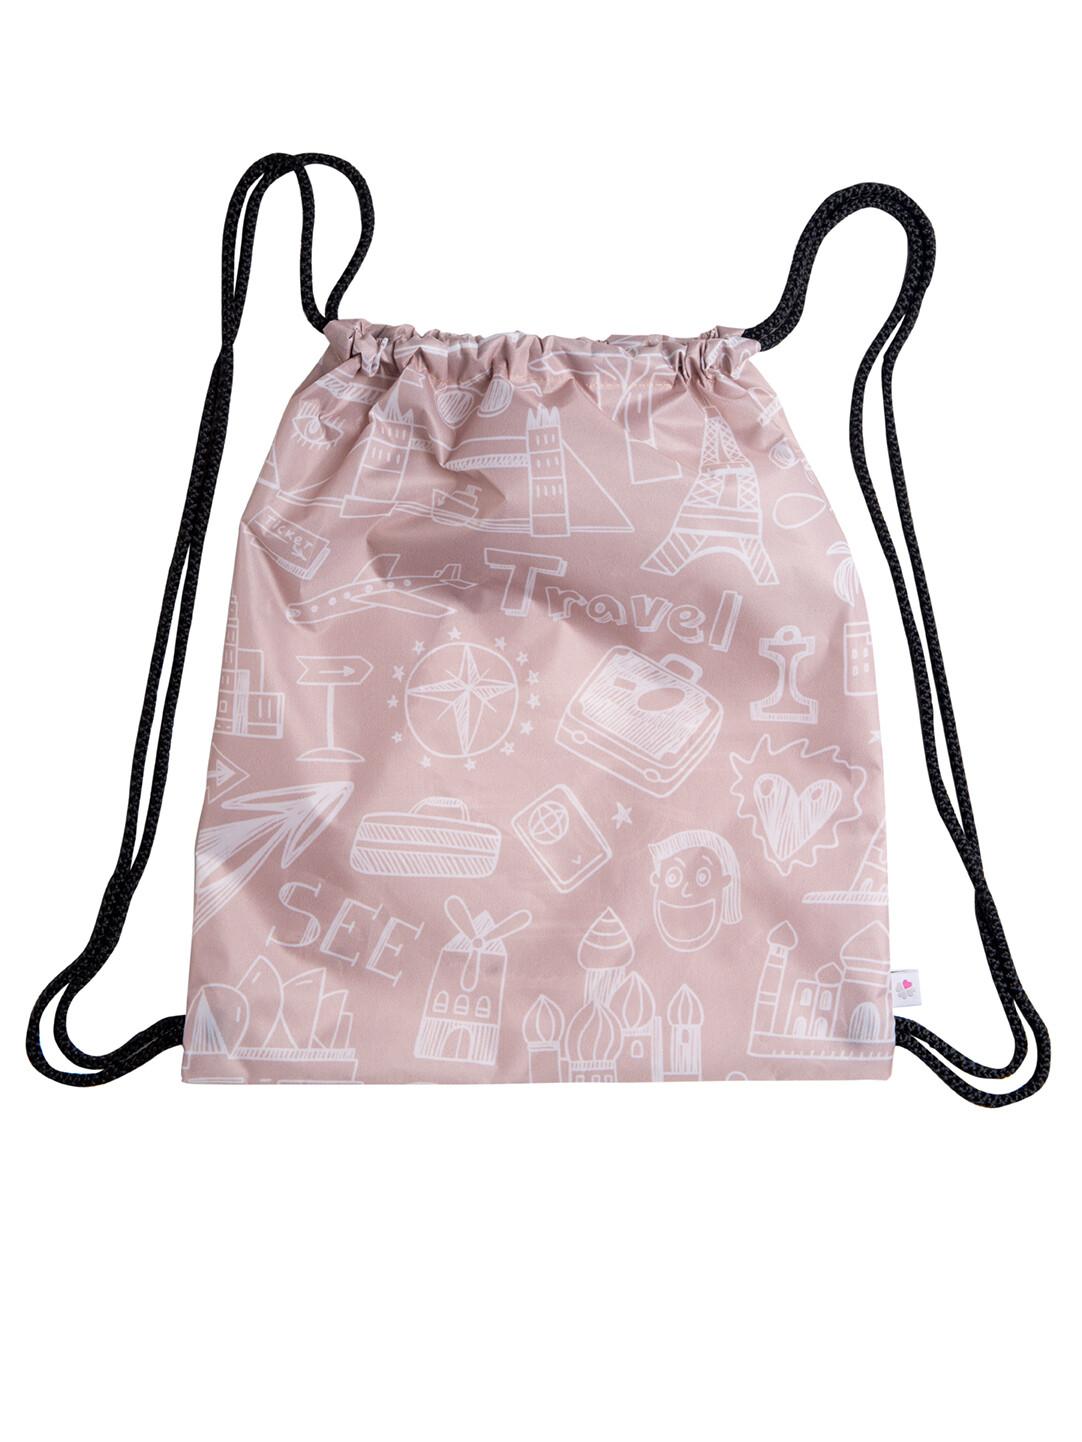 Рюкзак-мешок Travel бежевая